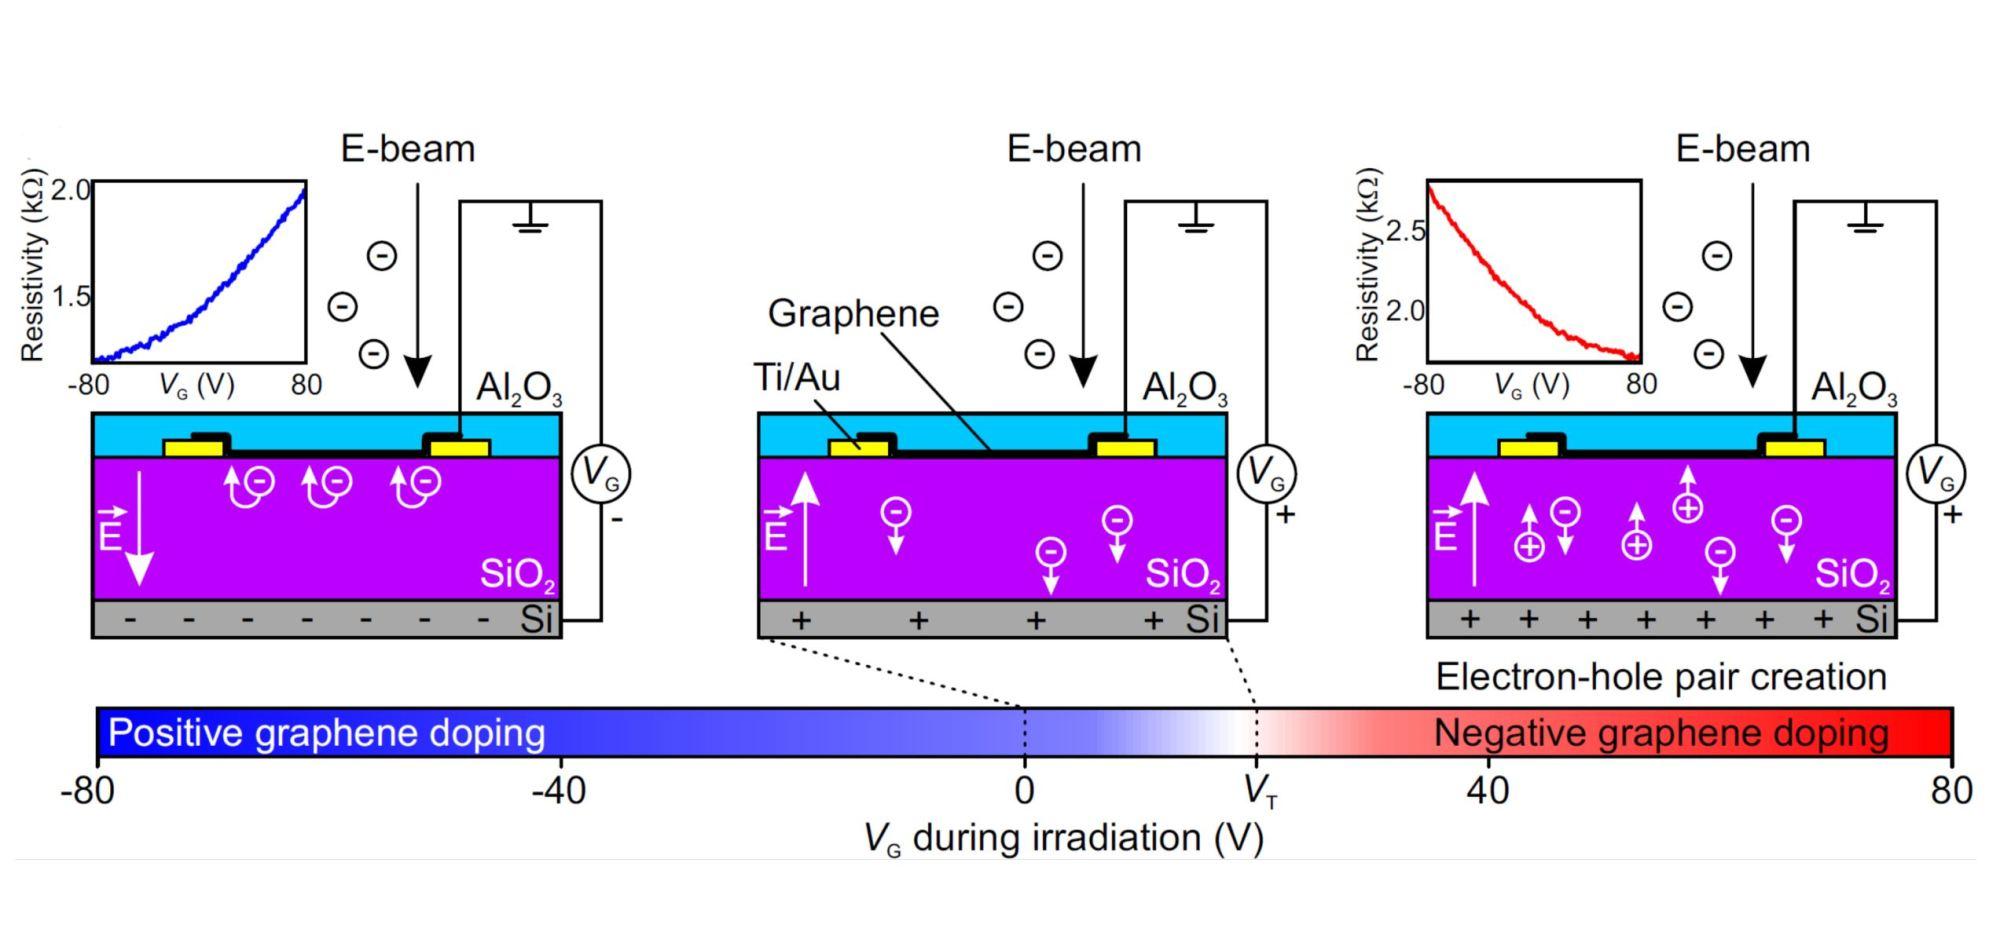 hight resolution of v star p proch zka d mare ek t ikola j echal ambipolar remote graphene doping by low energy electron beam irradiation